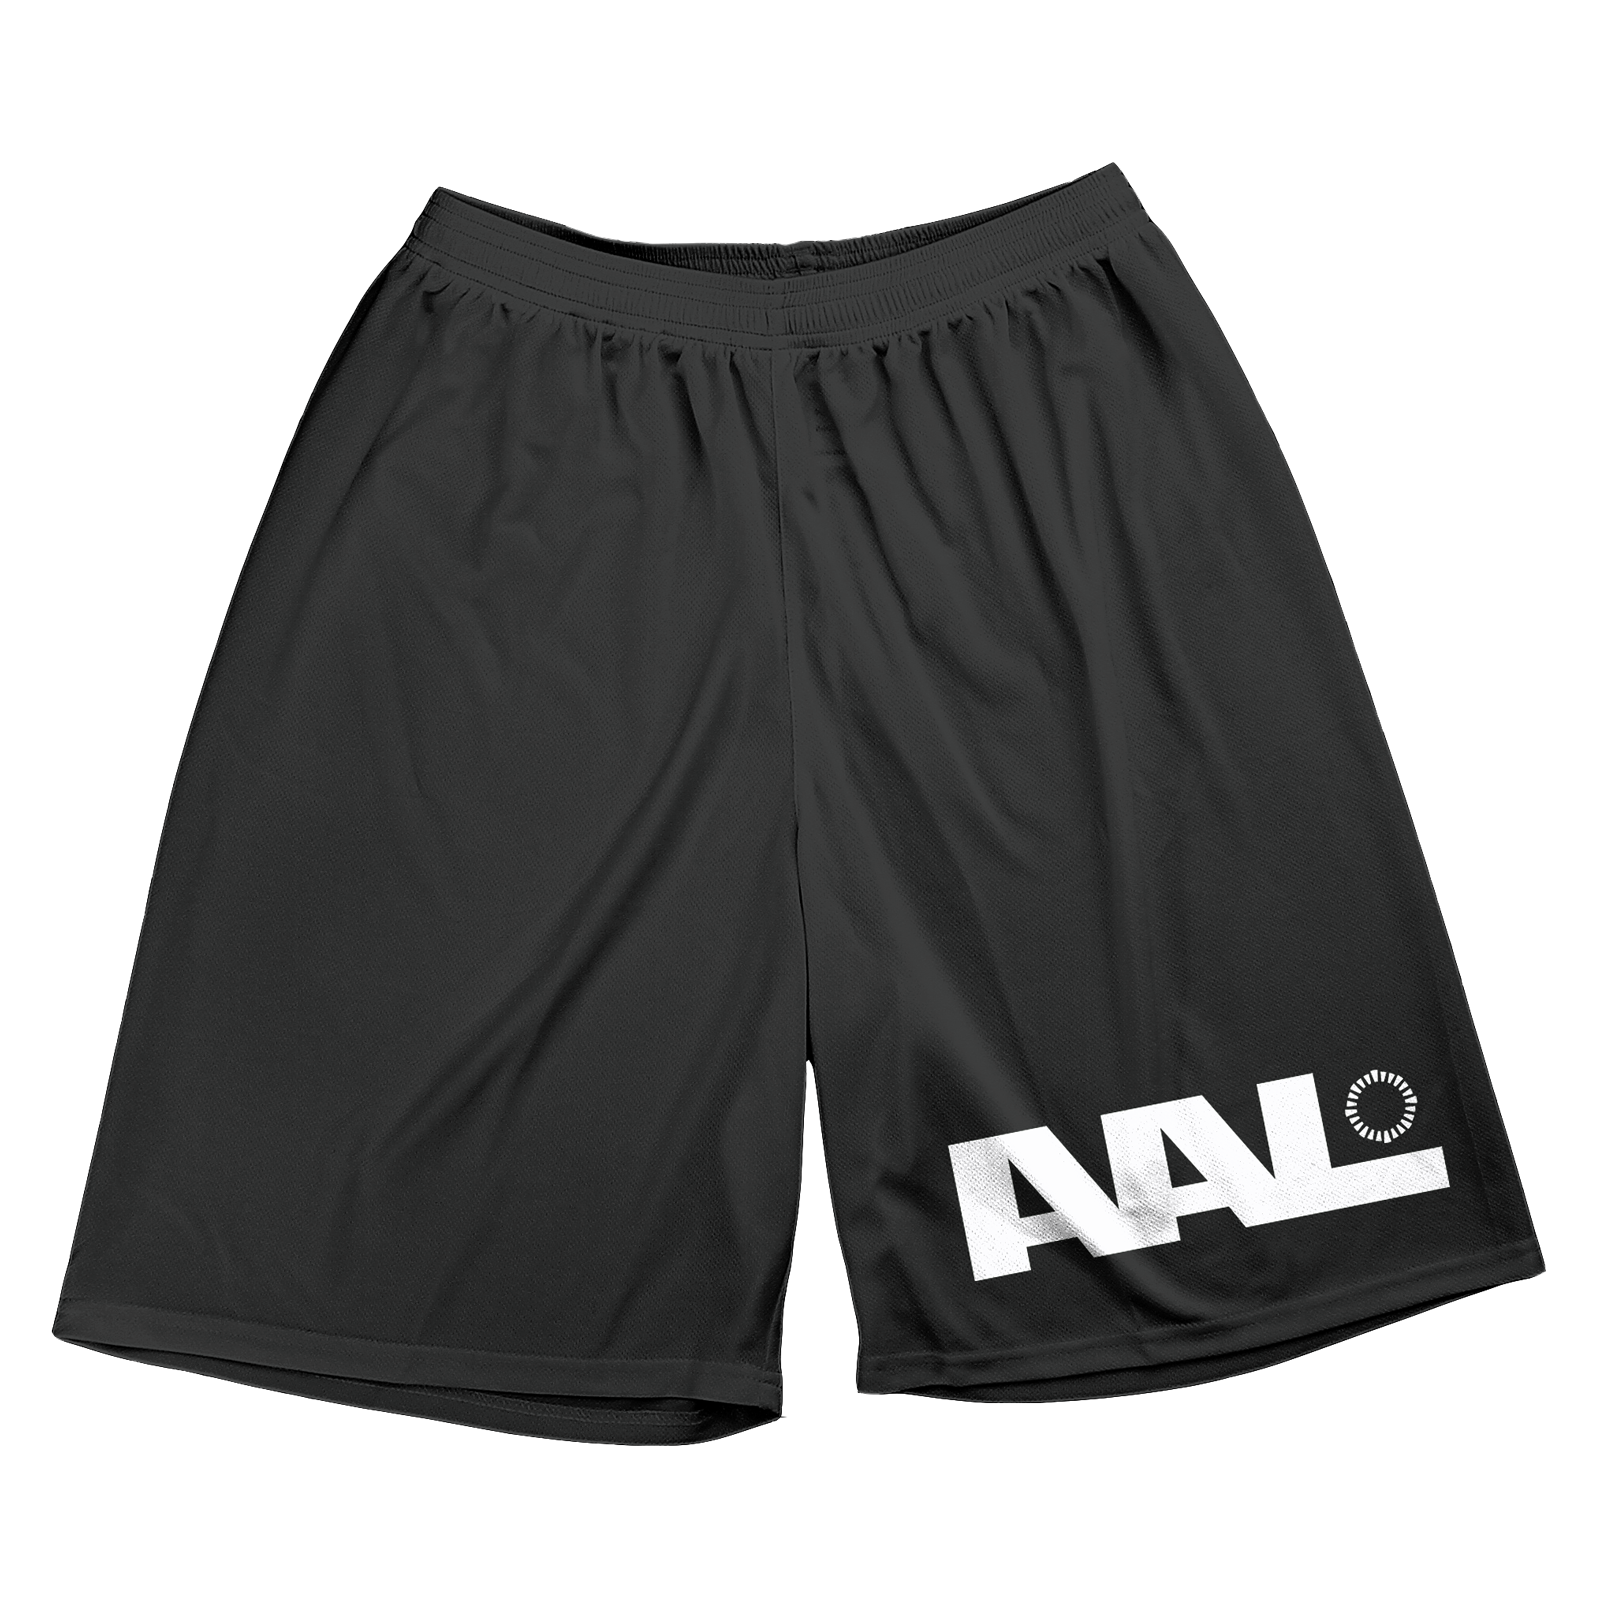 AAL Logo Gym Shorts